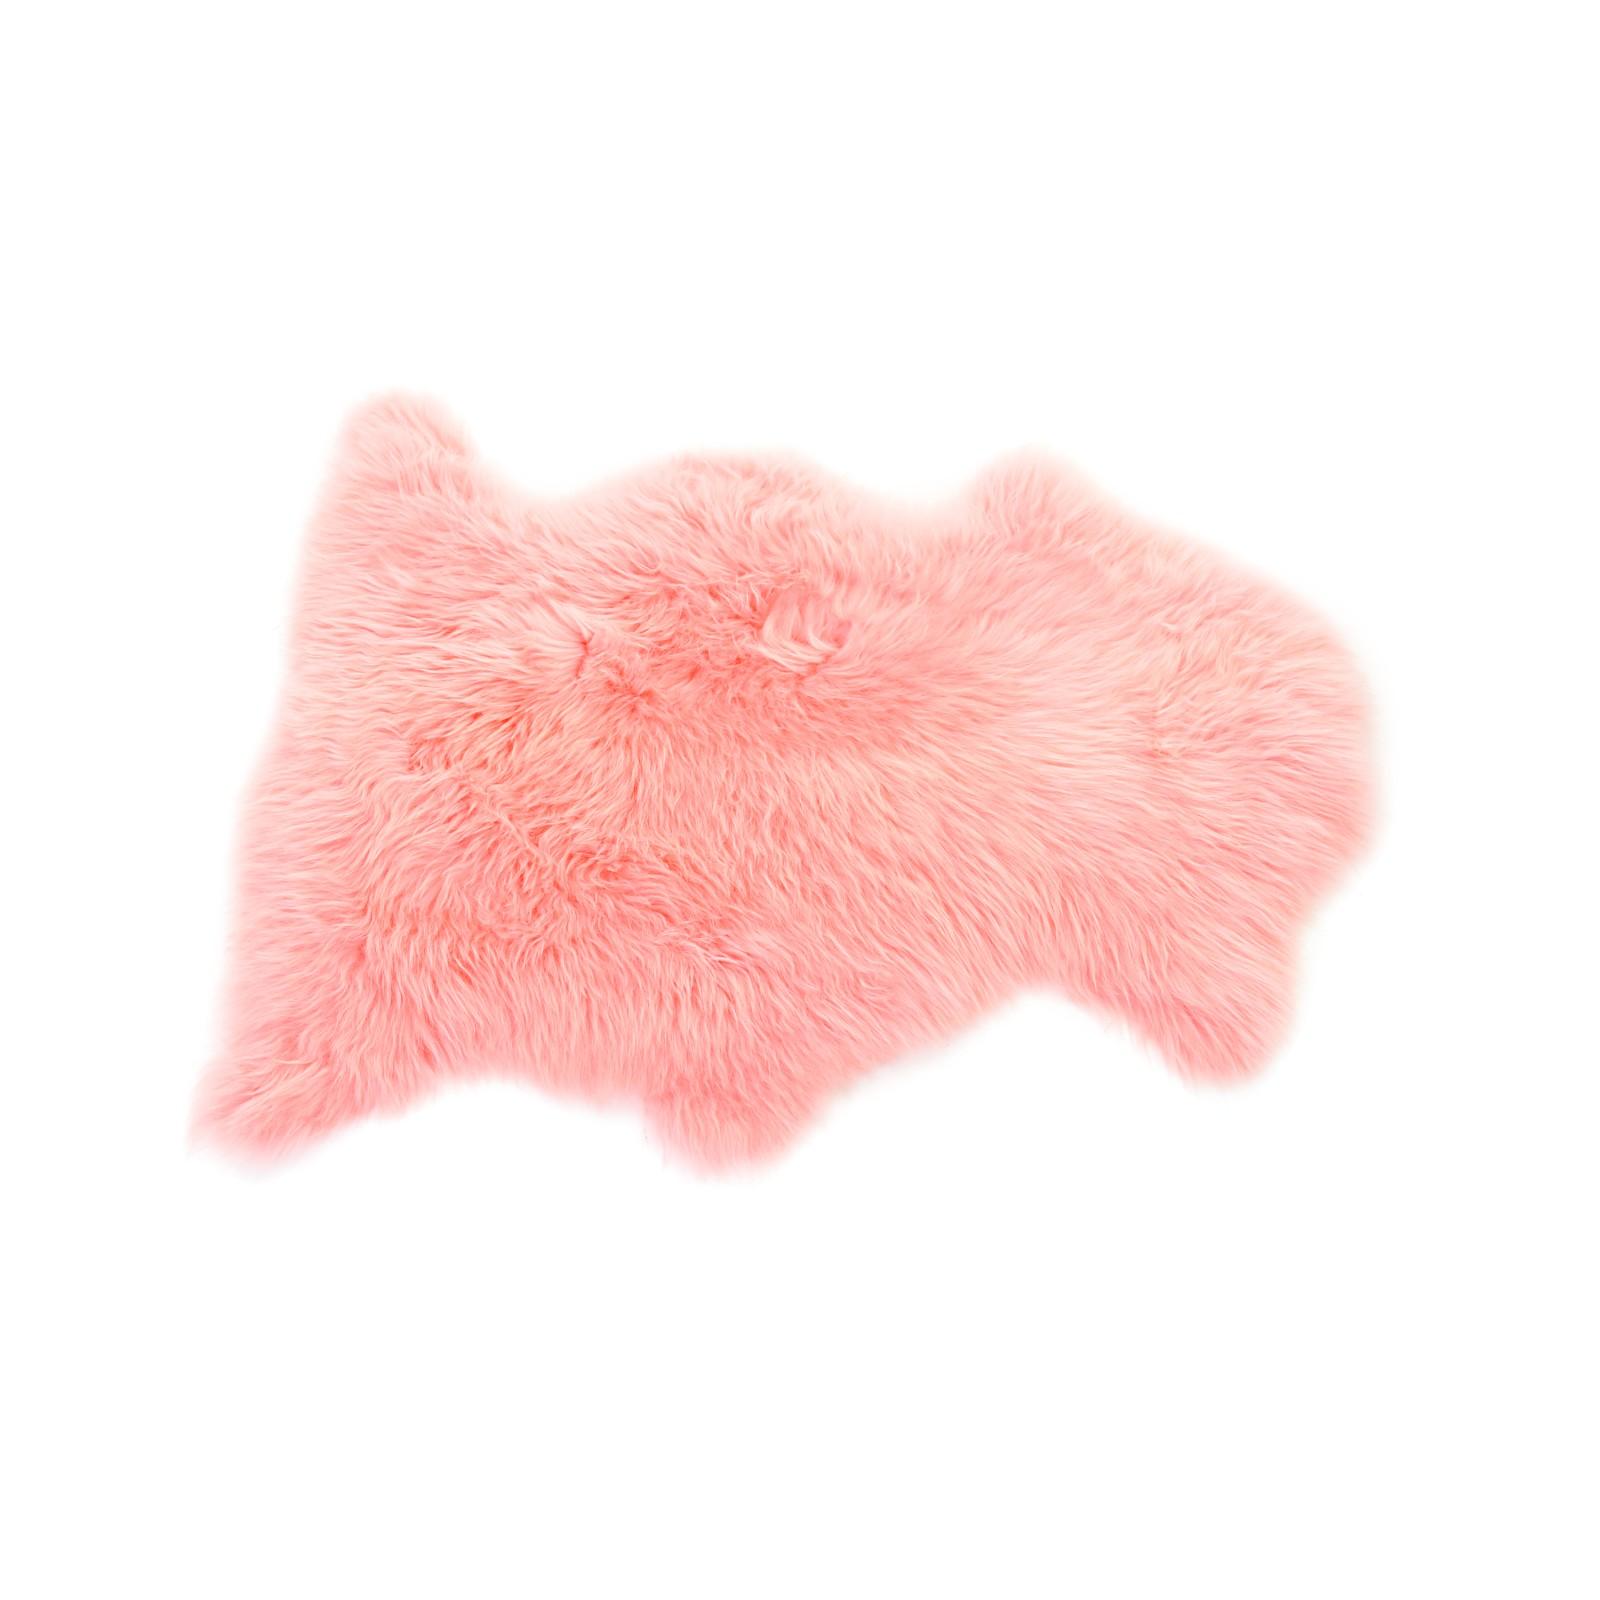 Sheepskin Rug in Baby Pink